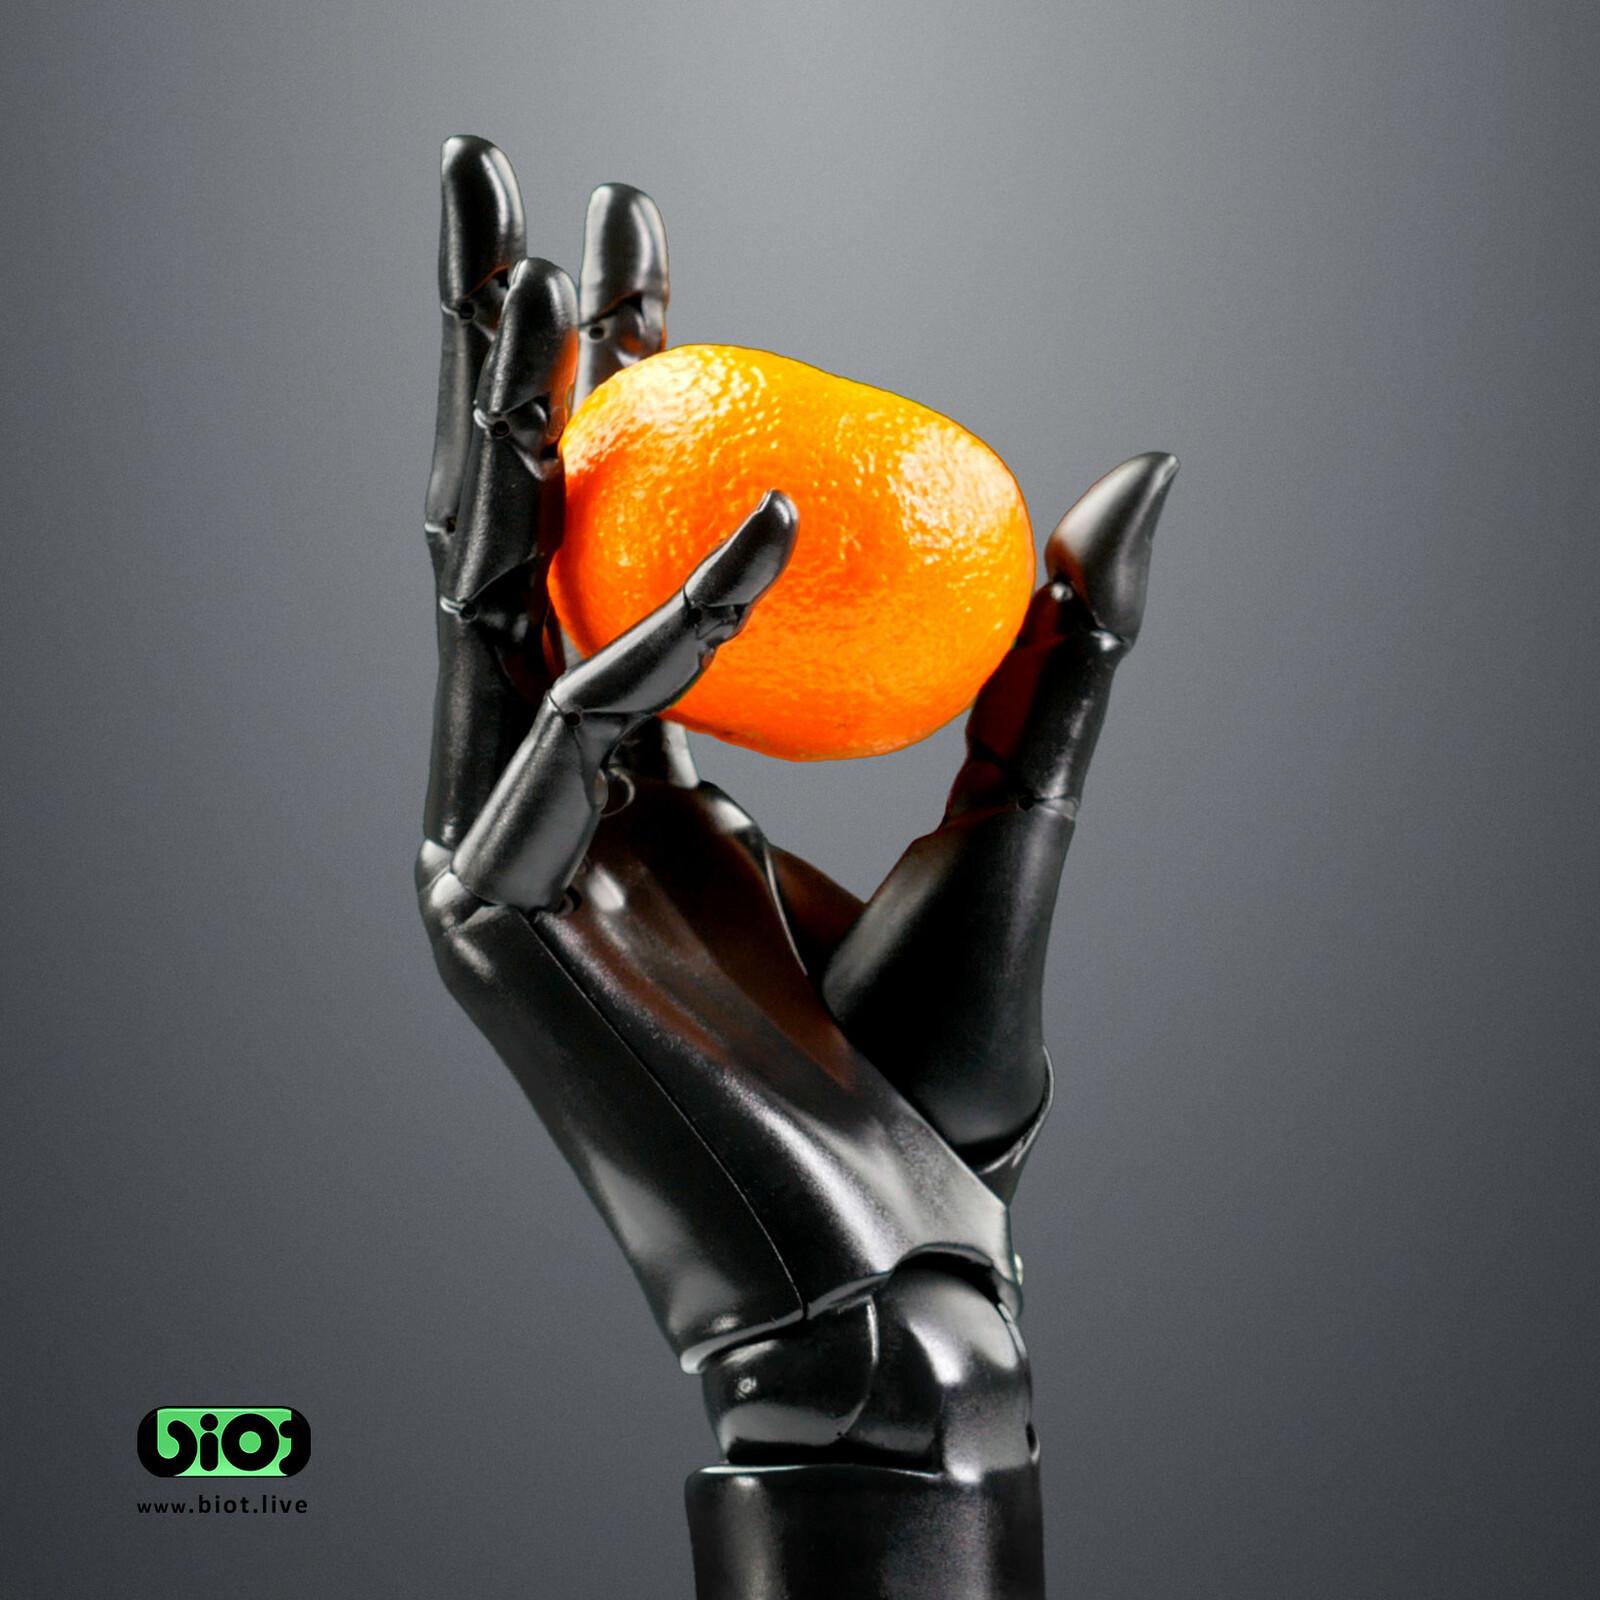 Biot Hand with orange